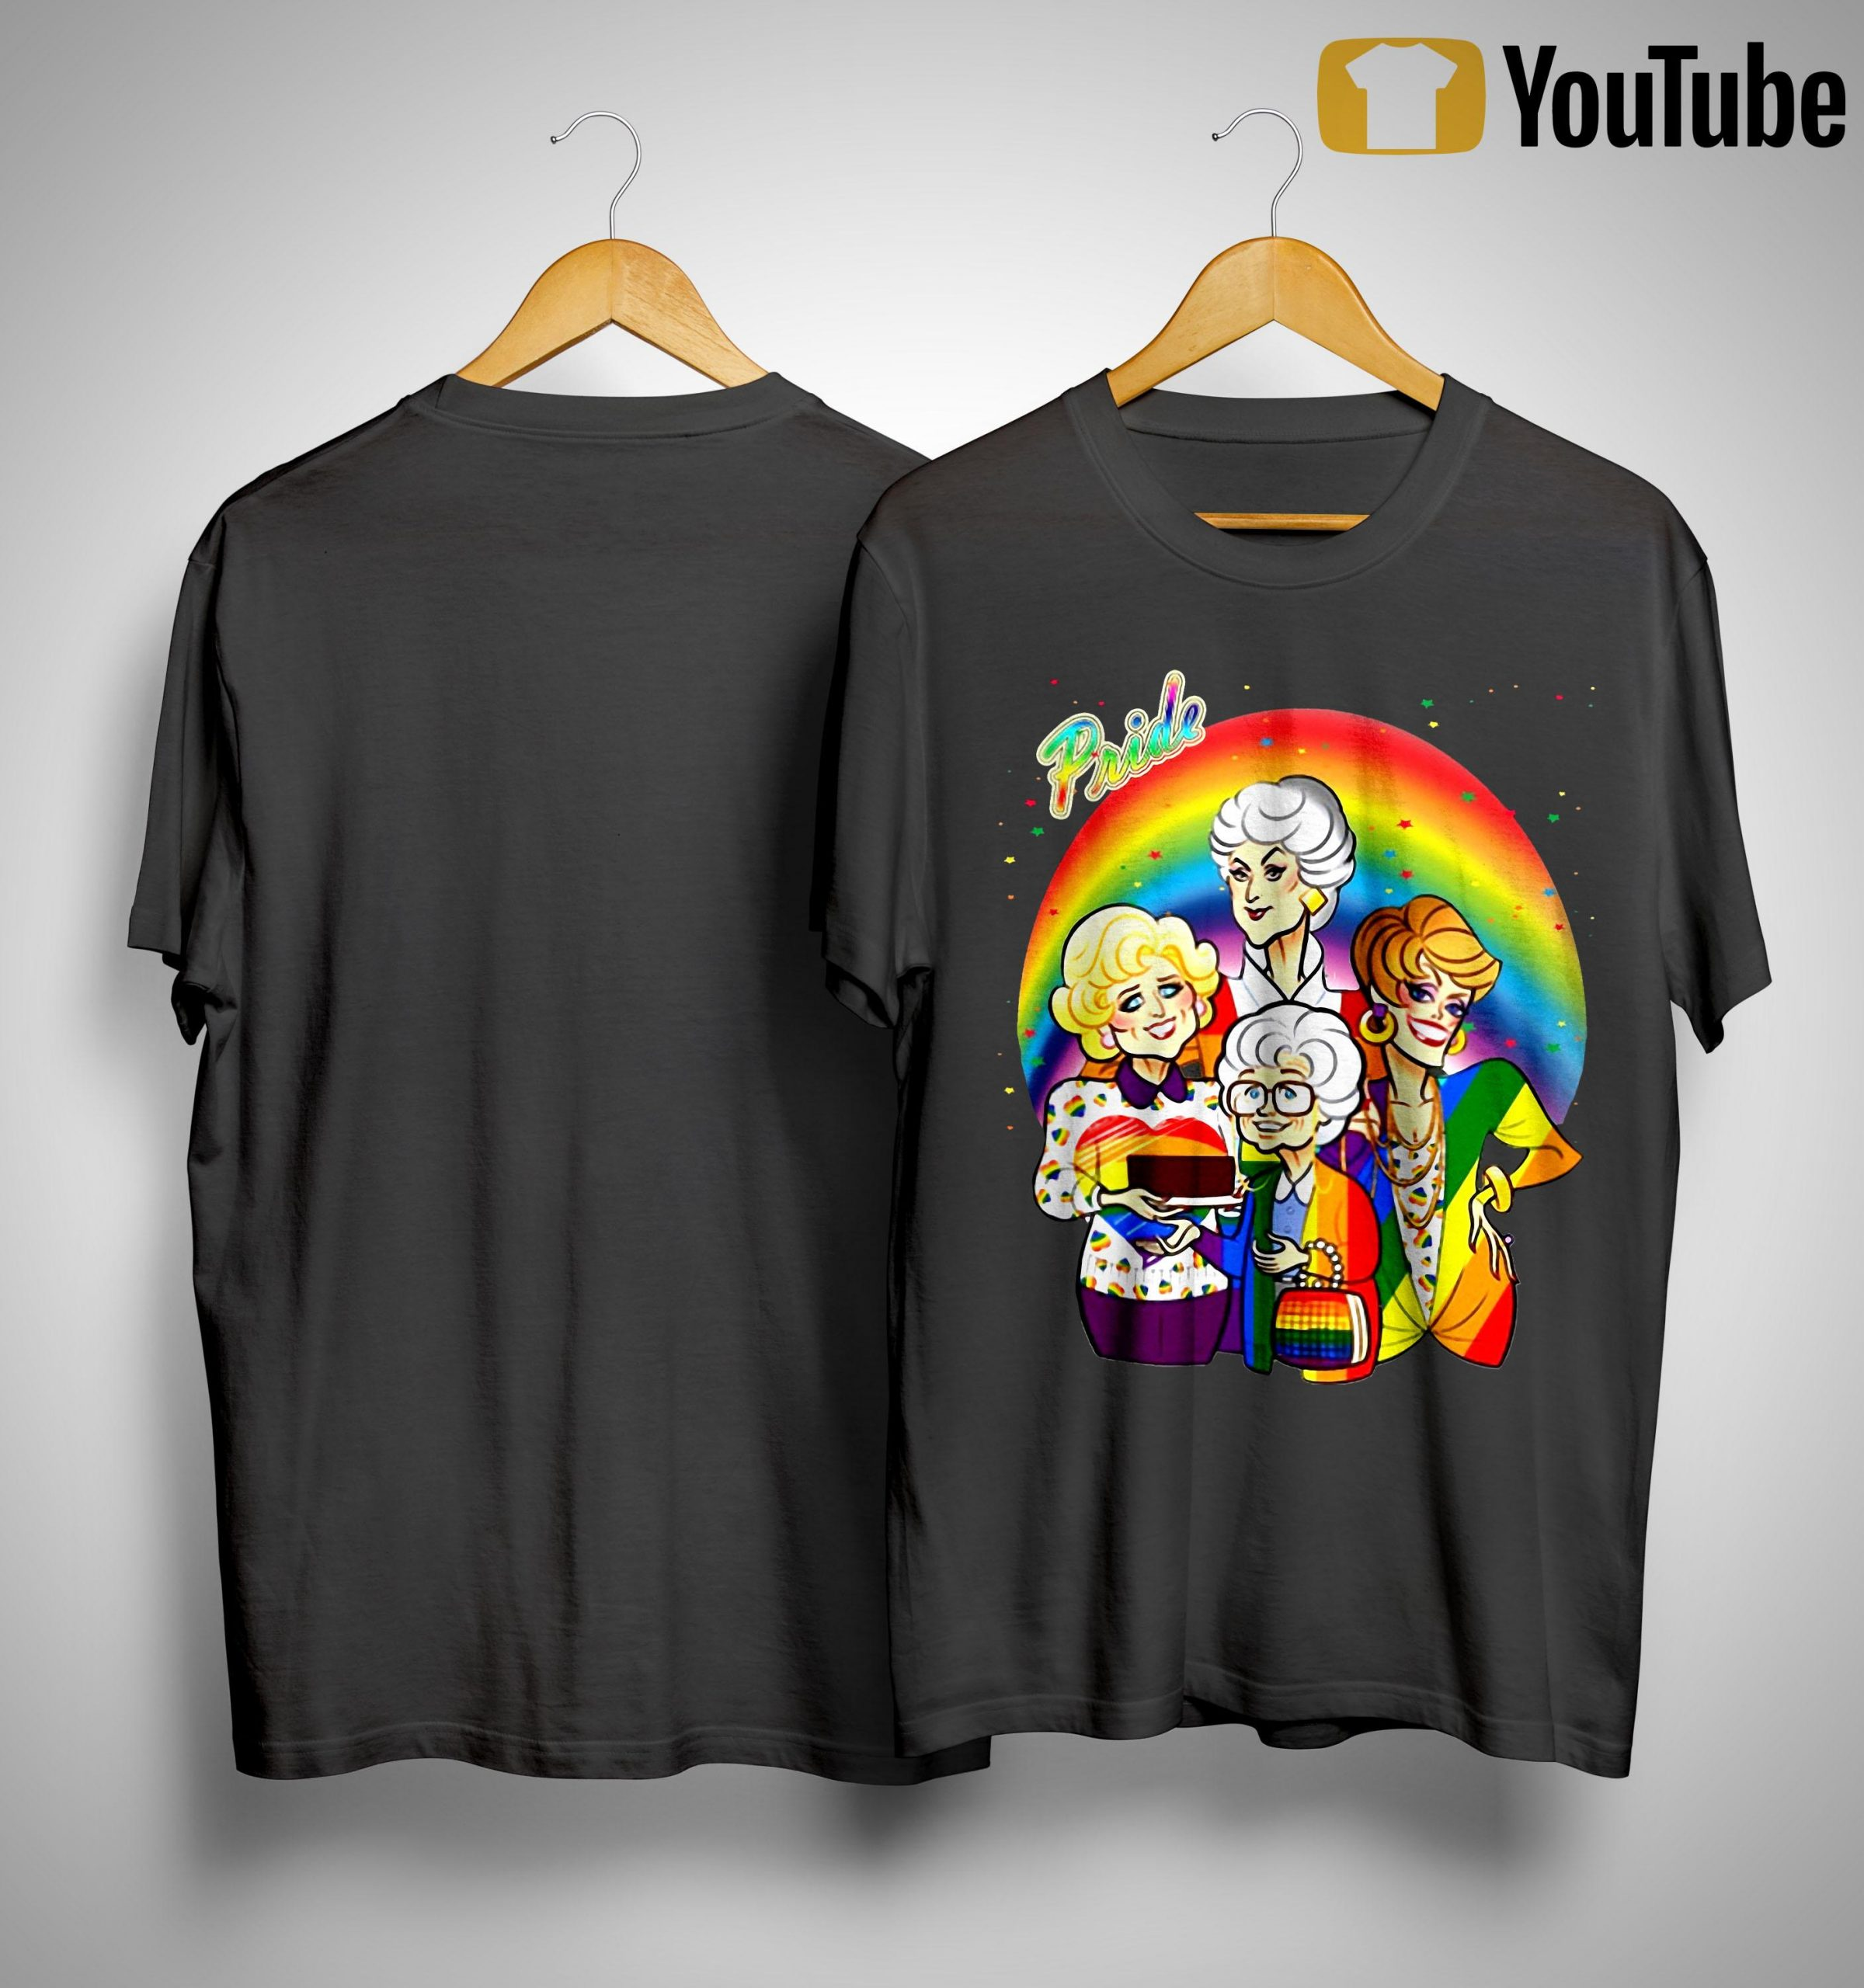 The Golden Girls Pride Month Shirt